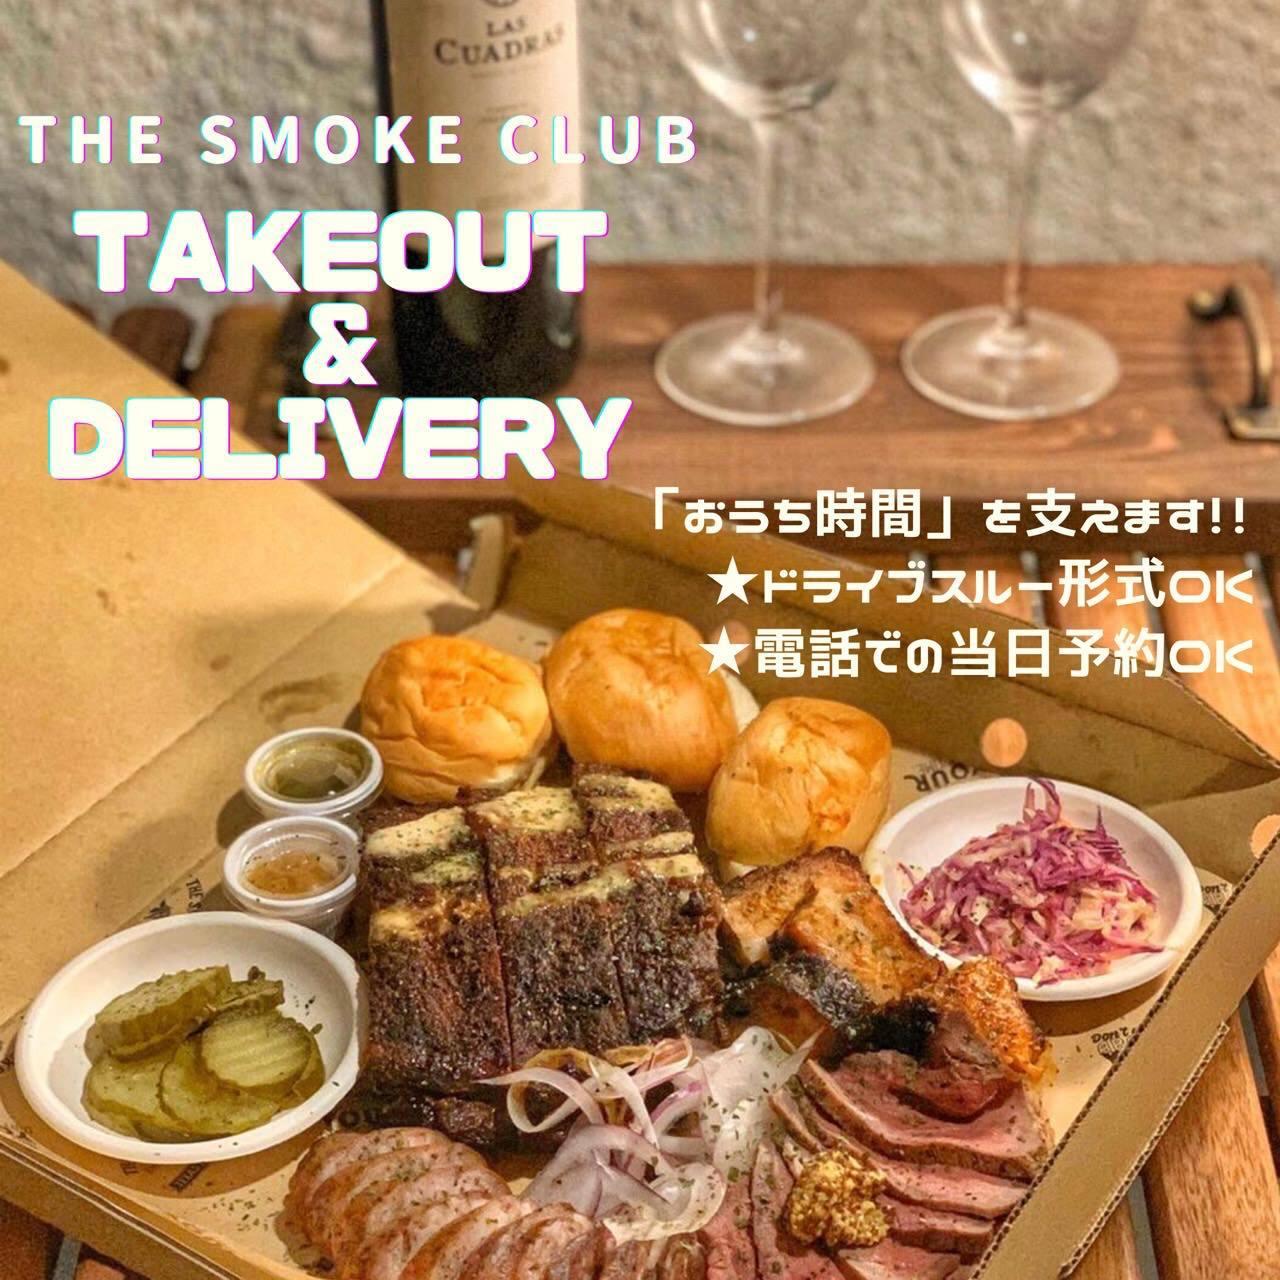 THE SMOKE CLUB ザ スモーク クラブ